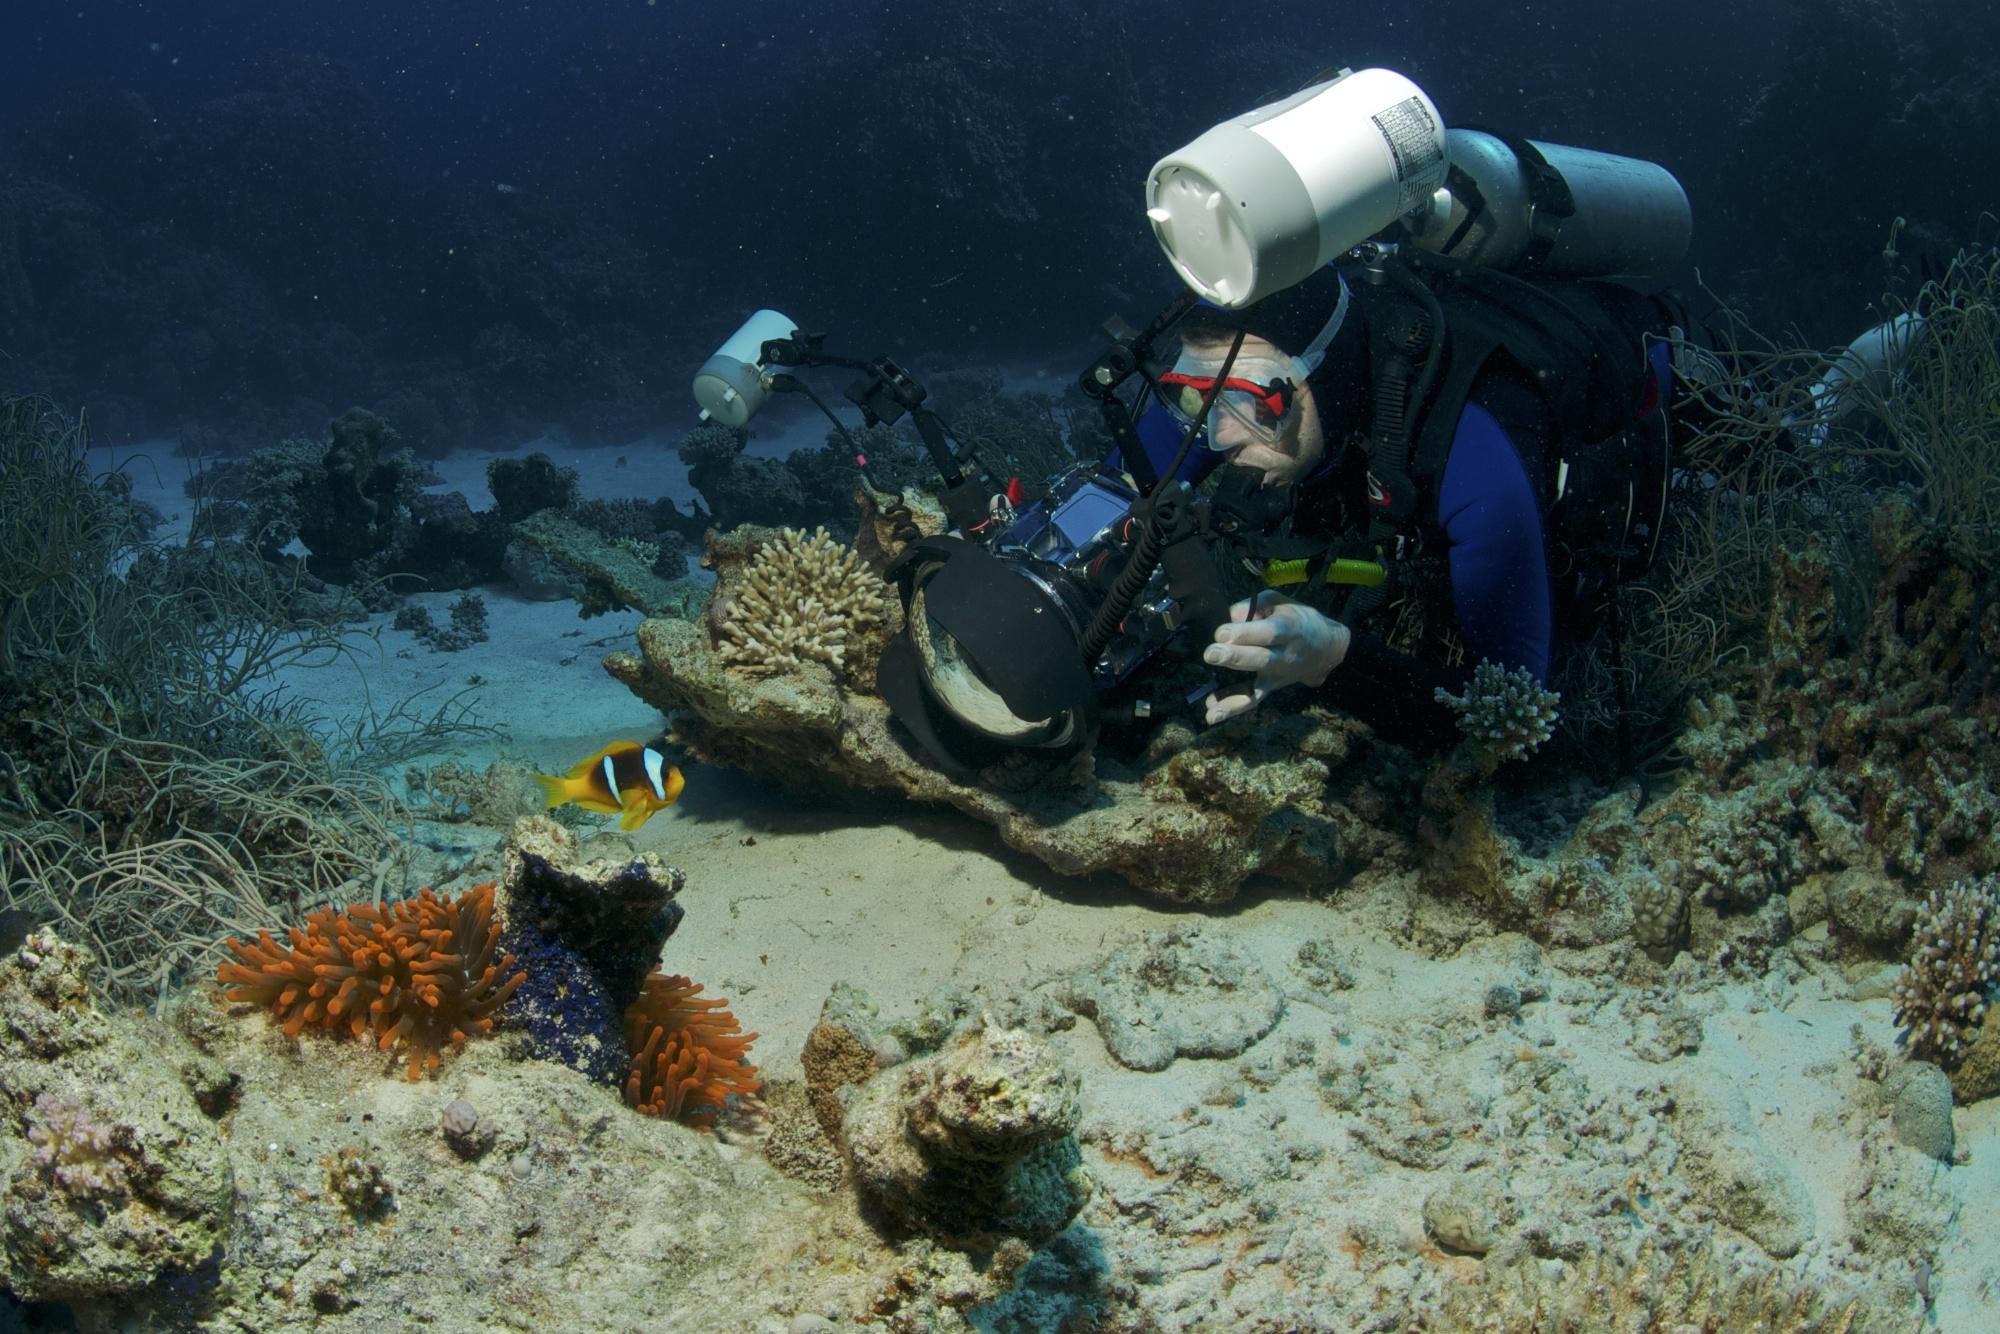 Underwater Photographer, Marsa Shagra Reef, Red Sea, Egypt